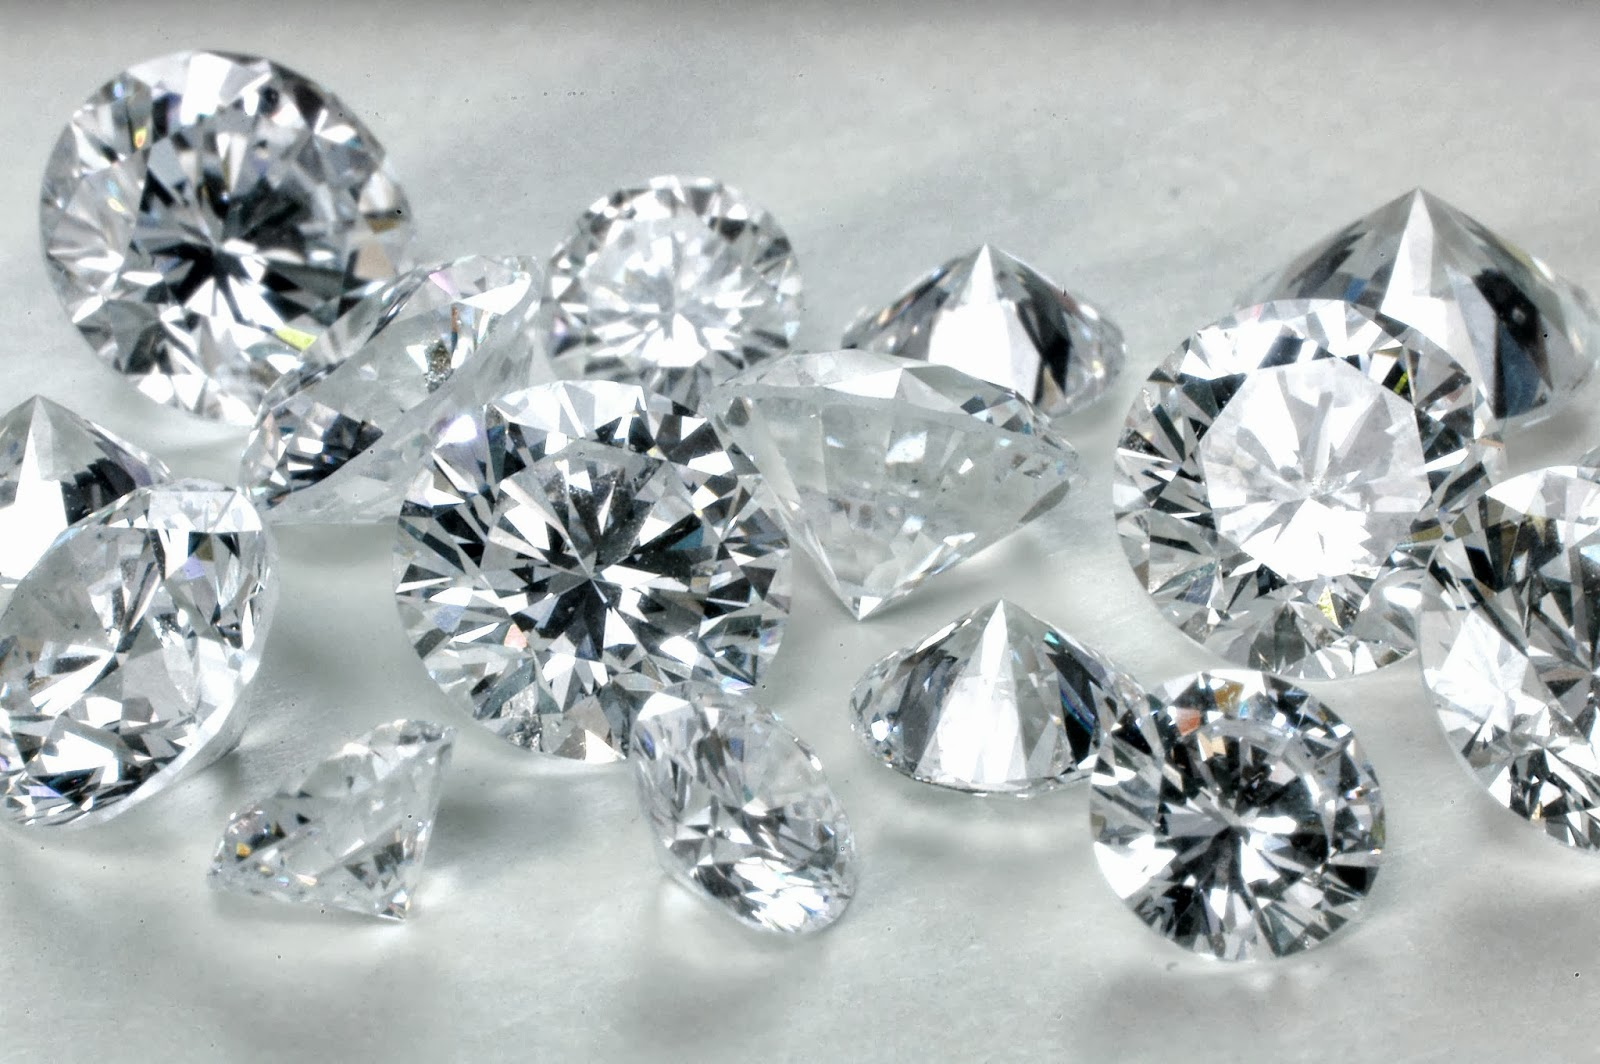 Diamond, Free Stock Photos | Pictures In Stitches